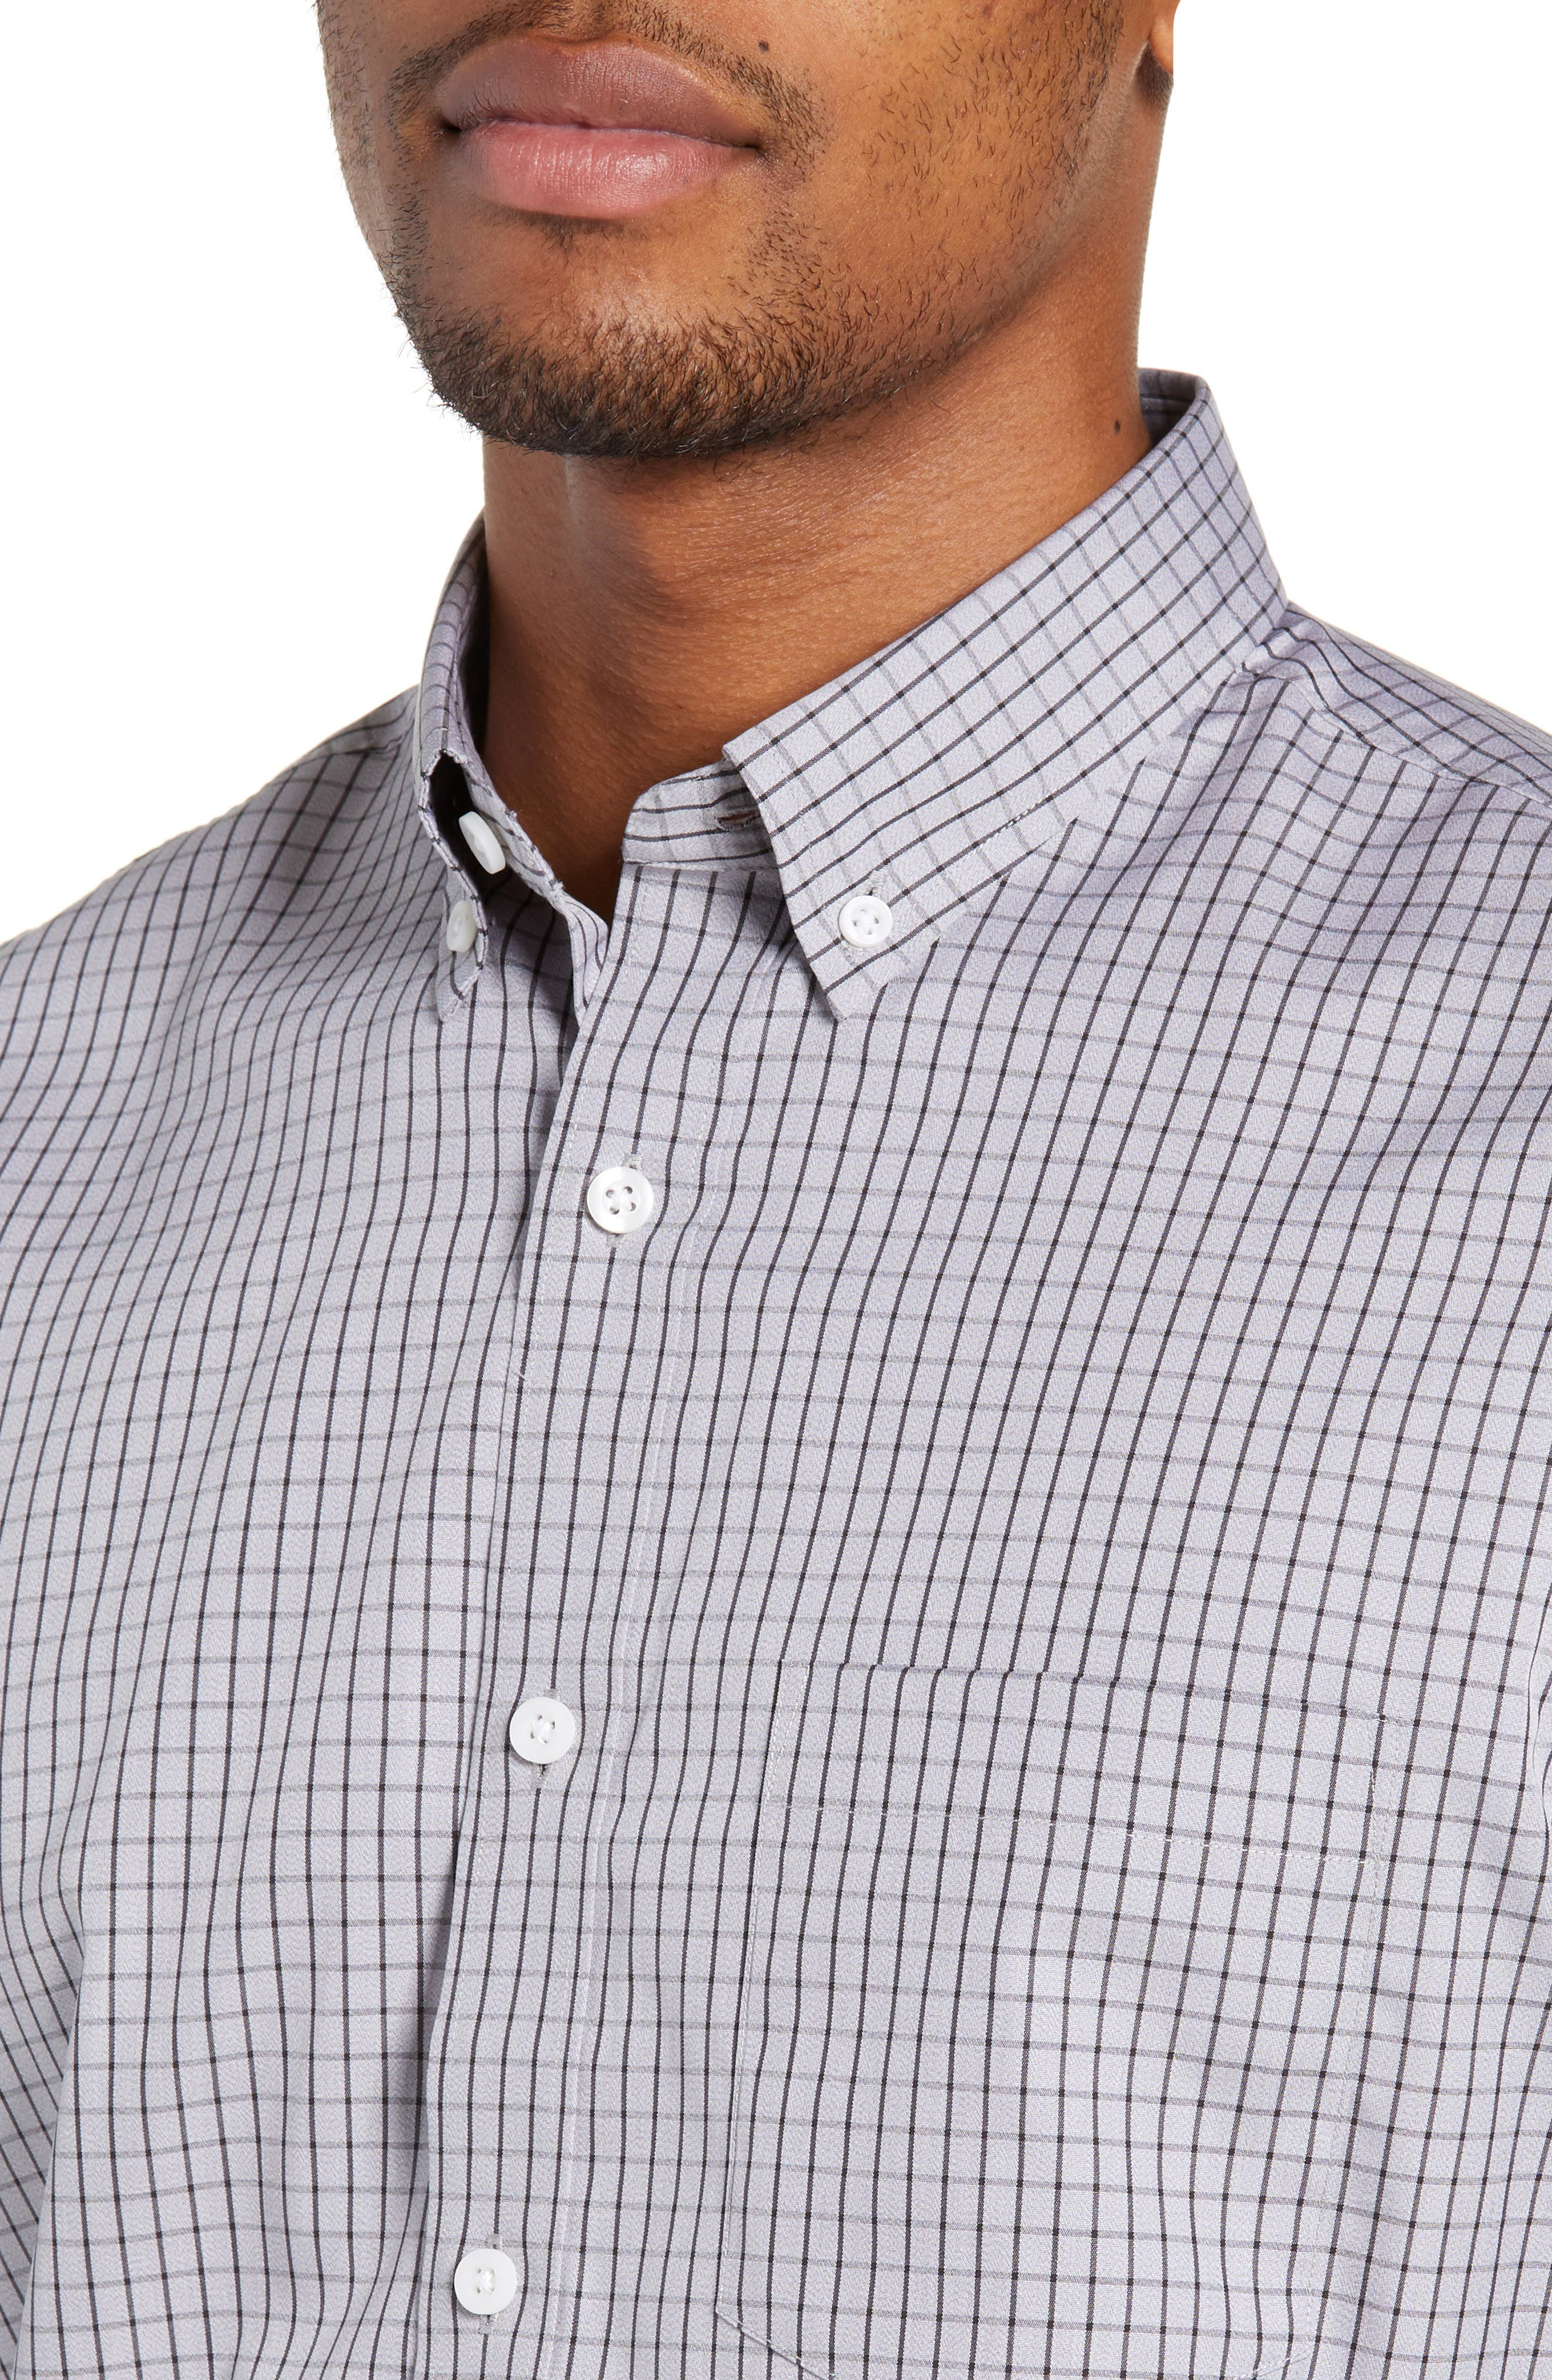 NORDSTROM MEN'S SHOP,                             Trim Fit Non-Iron Check Sport Shirt,                             Alternate thumbnail 2, color,                             GREY FILIGREE MINIGRID